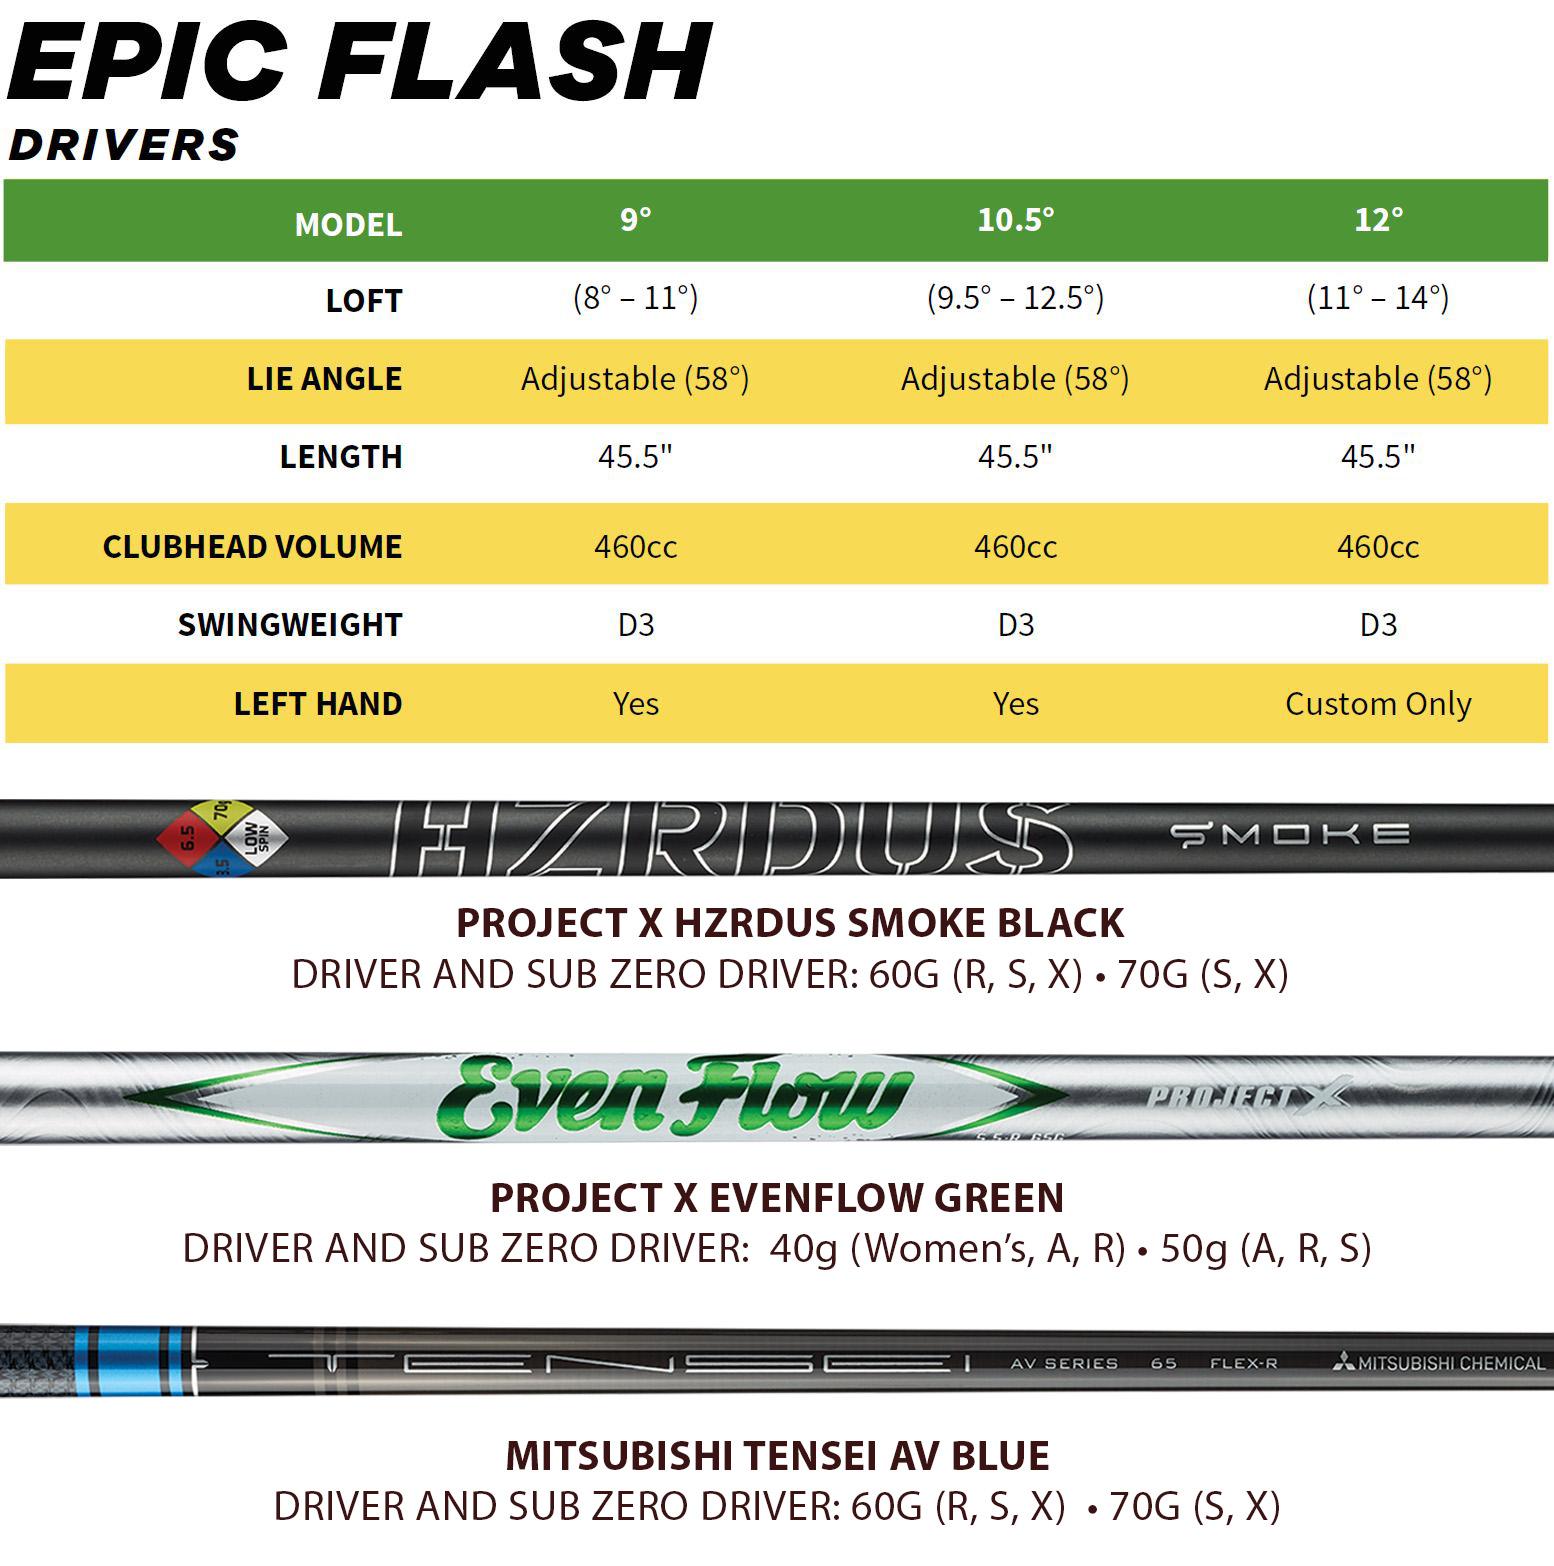 Epic Flash Women's Driver w/ EvenFlow Green 40 Shaft